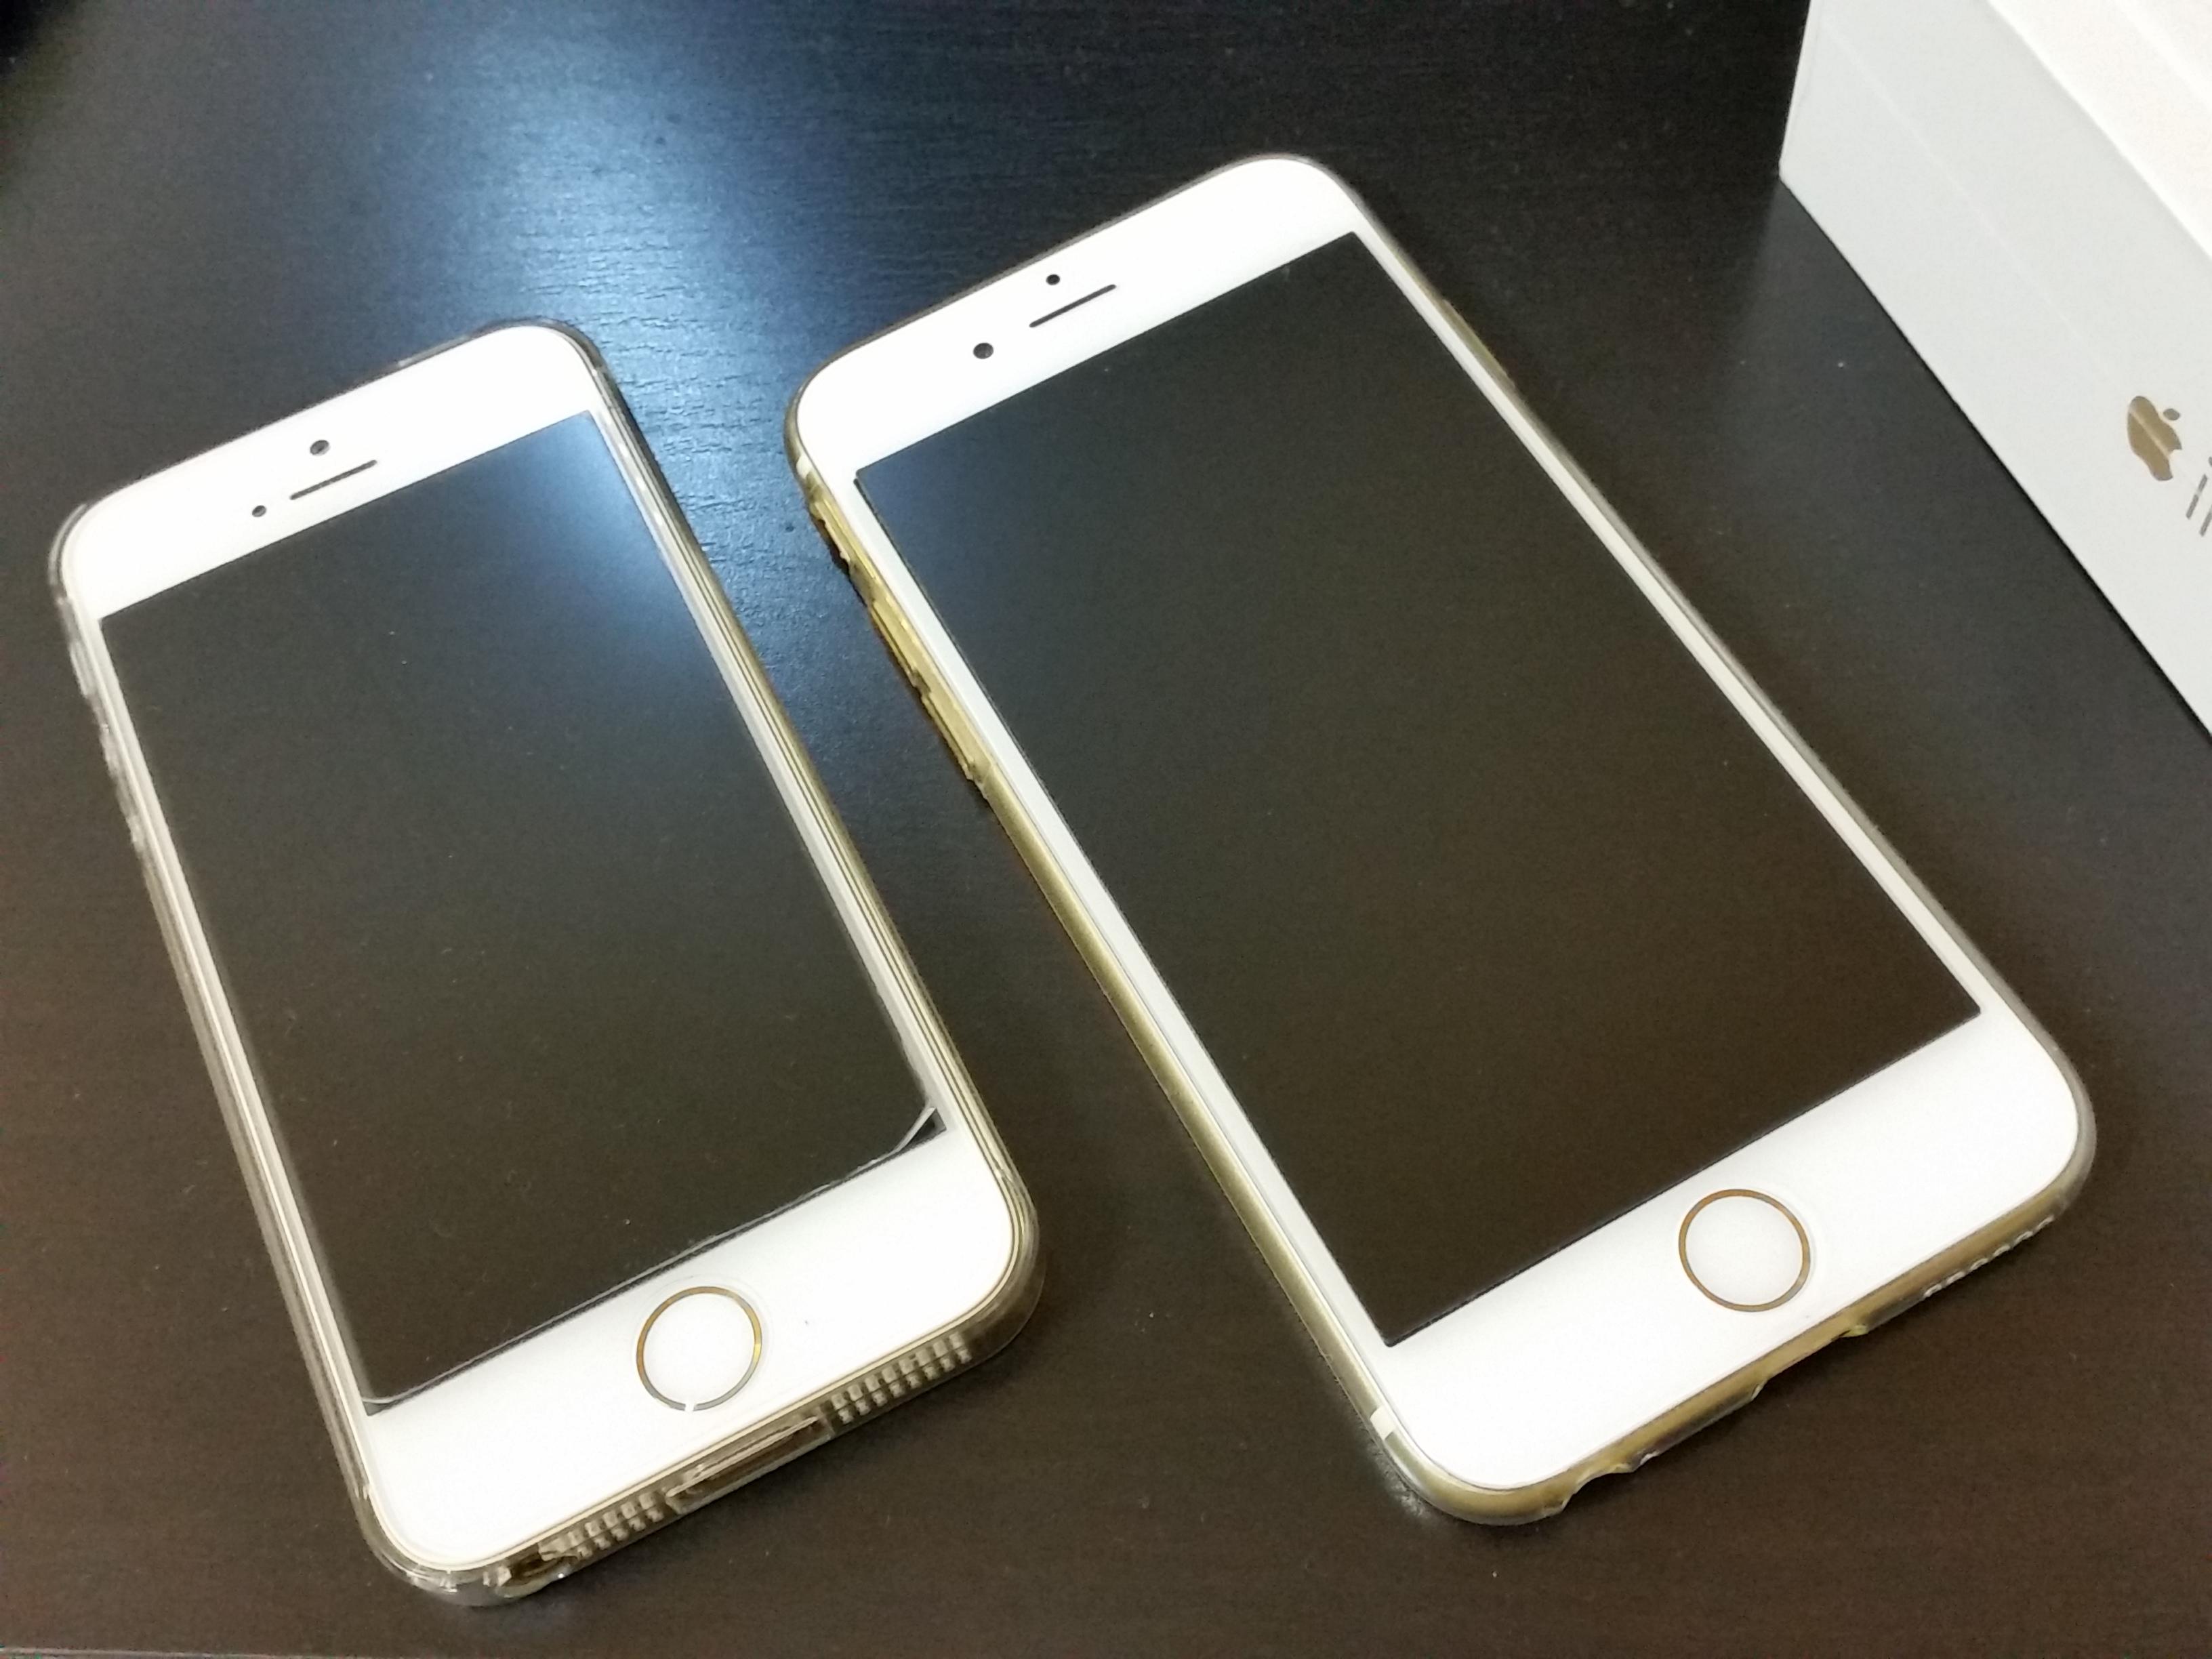 iPhone 5sユーザーはiPhone 6sへの購入を思い悩む人が多い?本体サイズの大きさがネックに